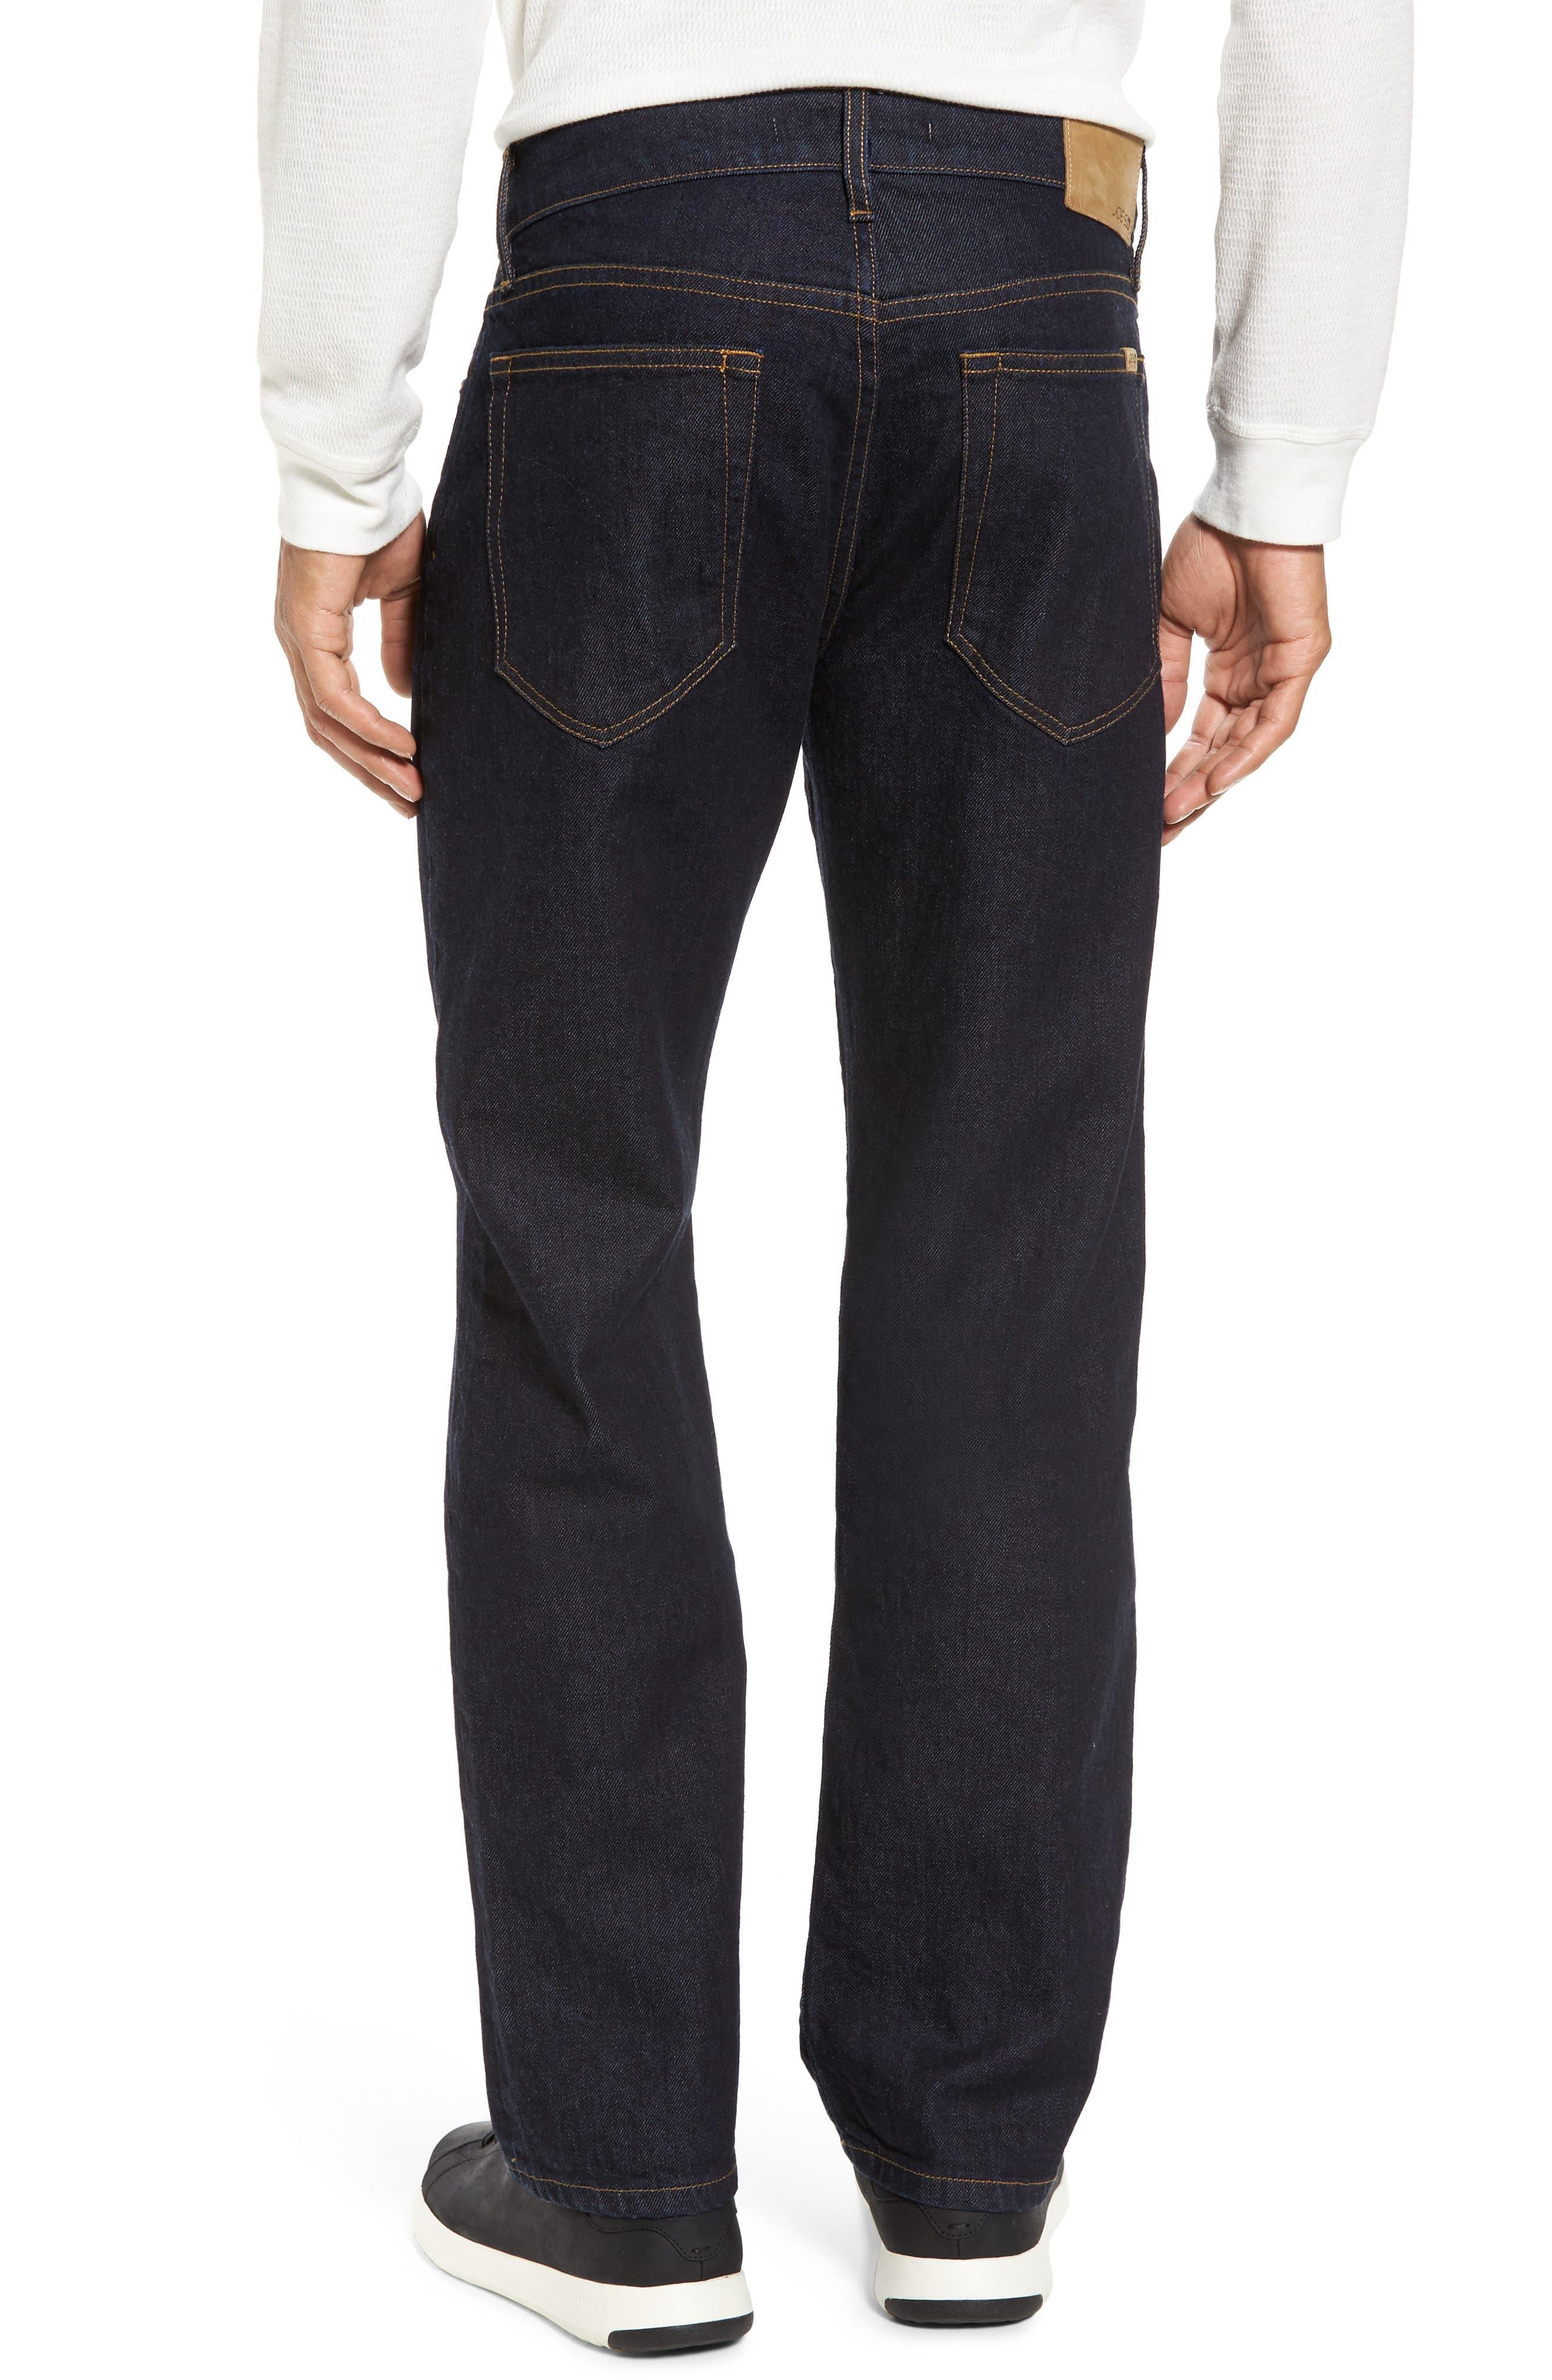 Brixton Slim Straight Leg Jeans,                             Alternate thumbnail 2, color,                             Halford